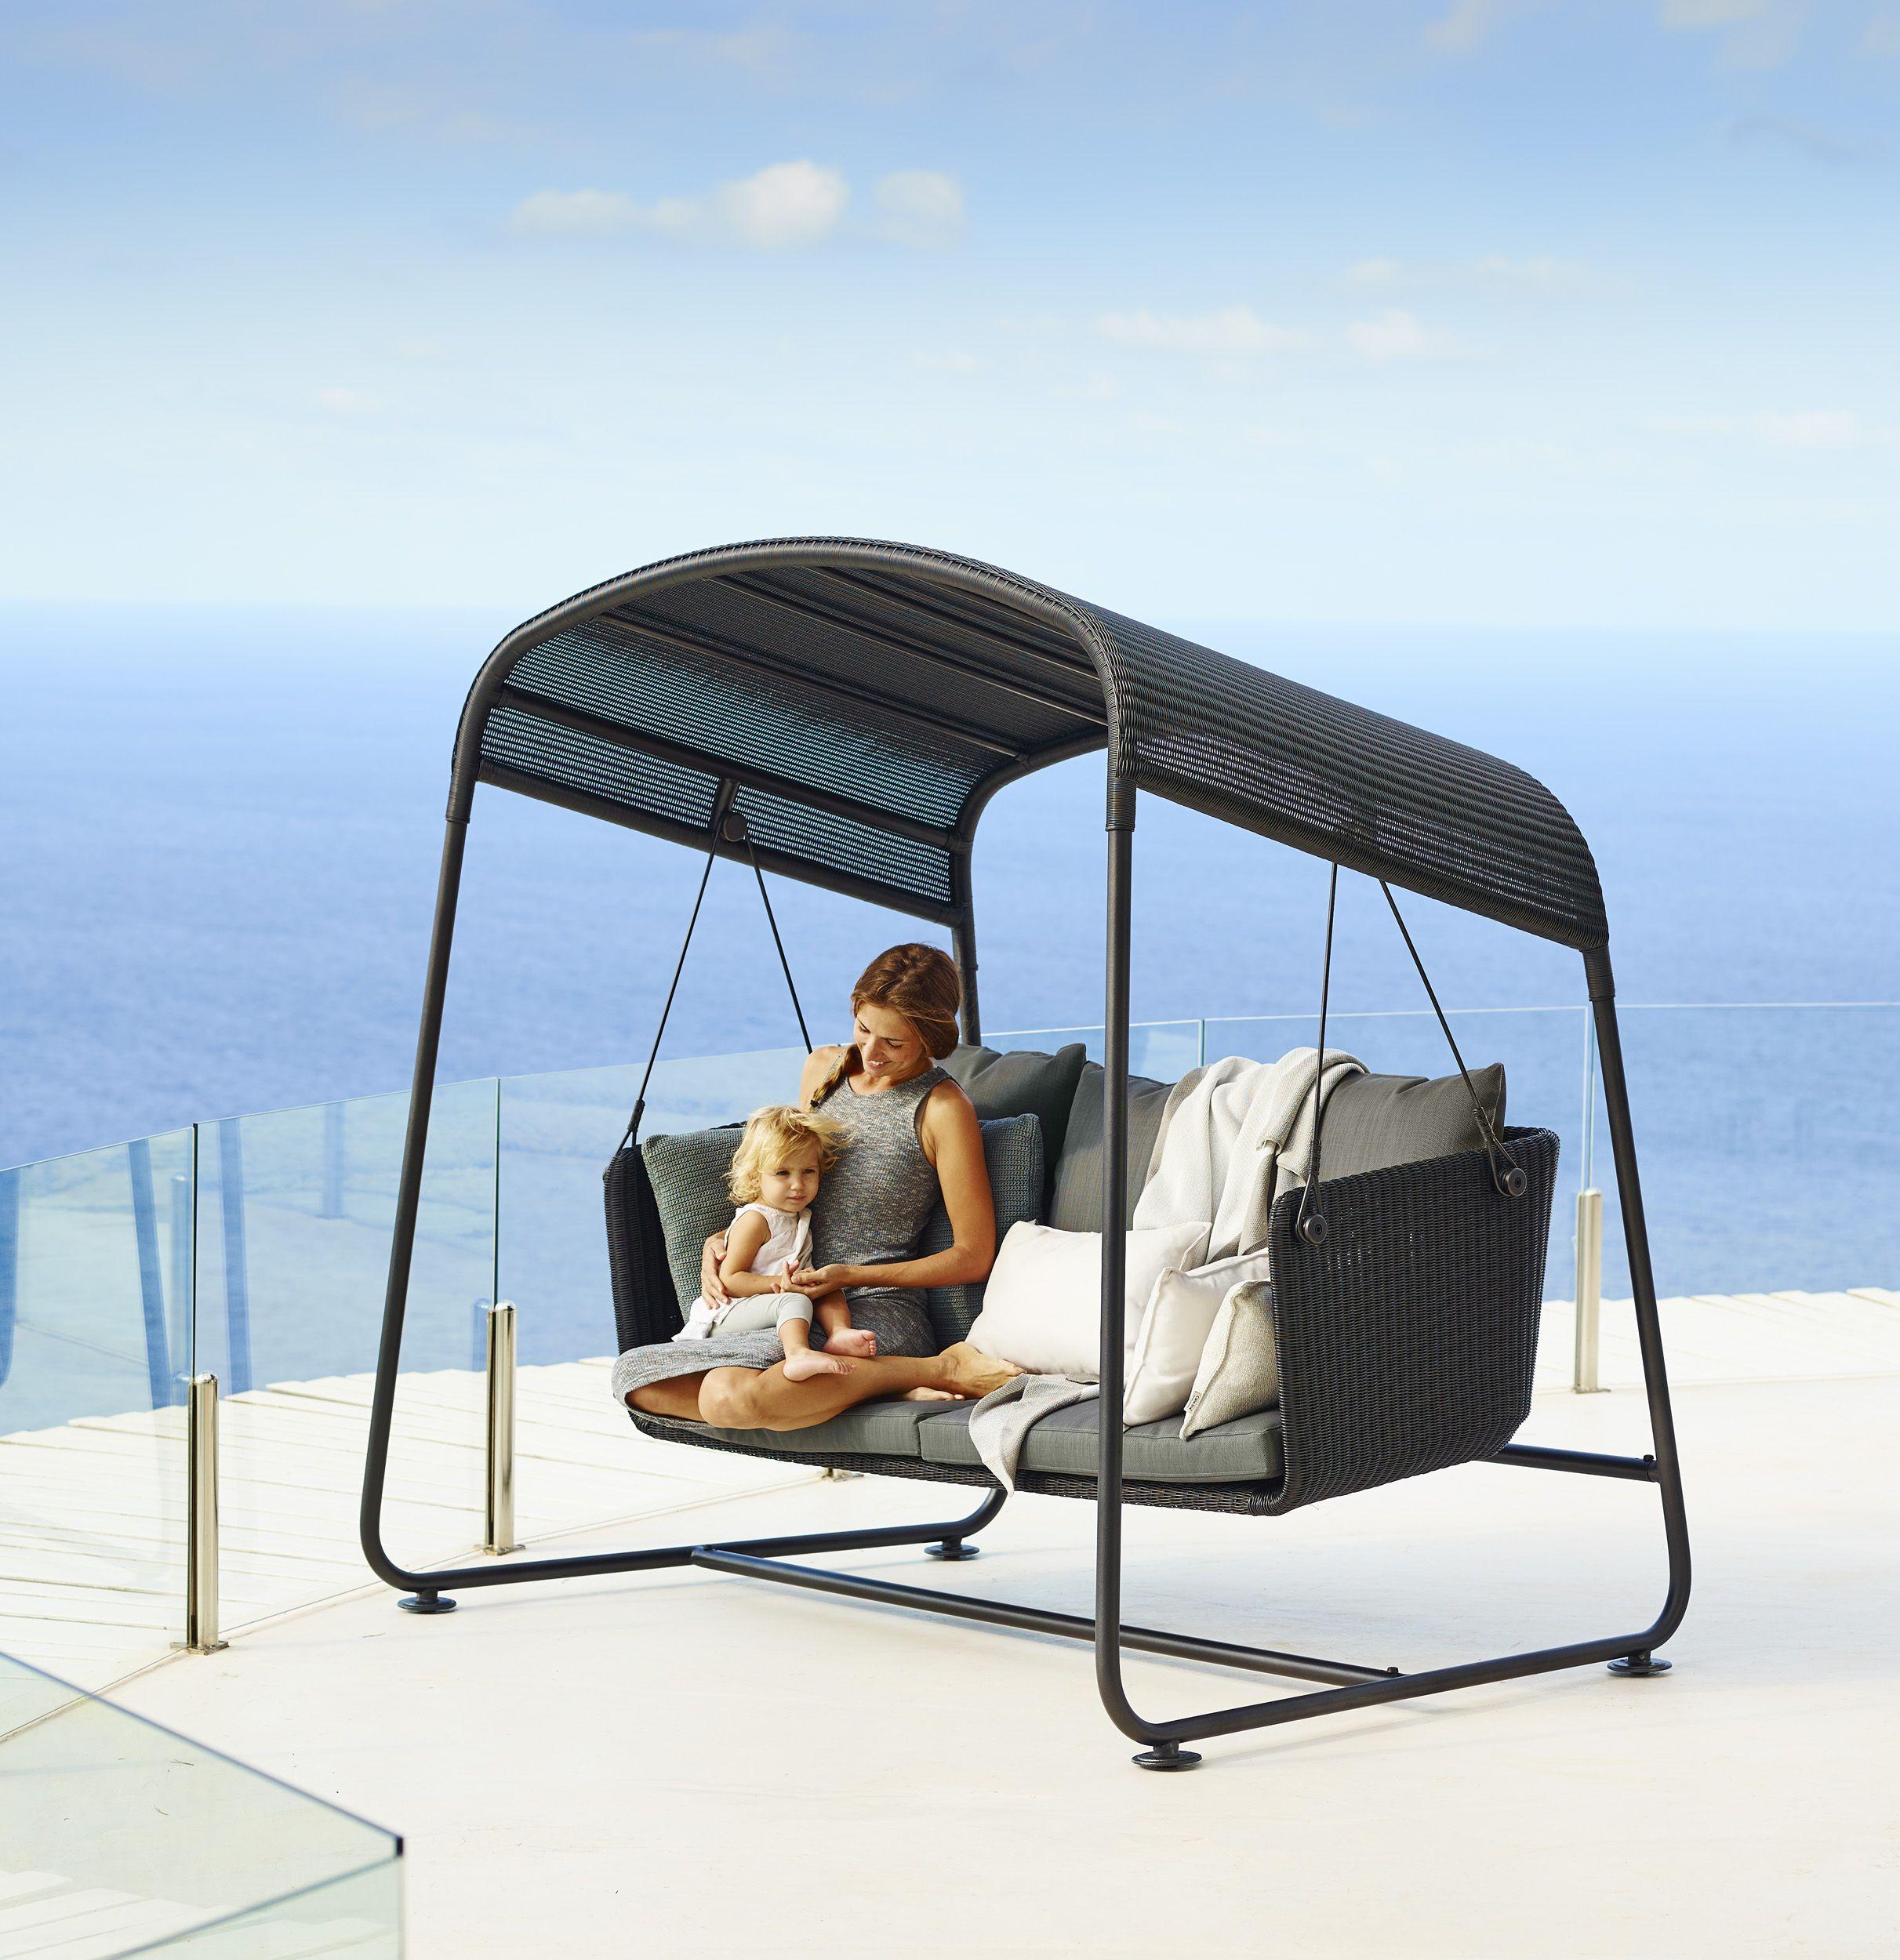 Cave Swing Sofa, grey Cane-line weave with Sunbrella Natté cushions ...